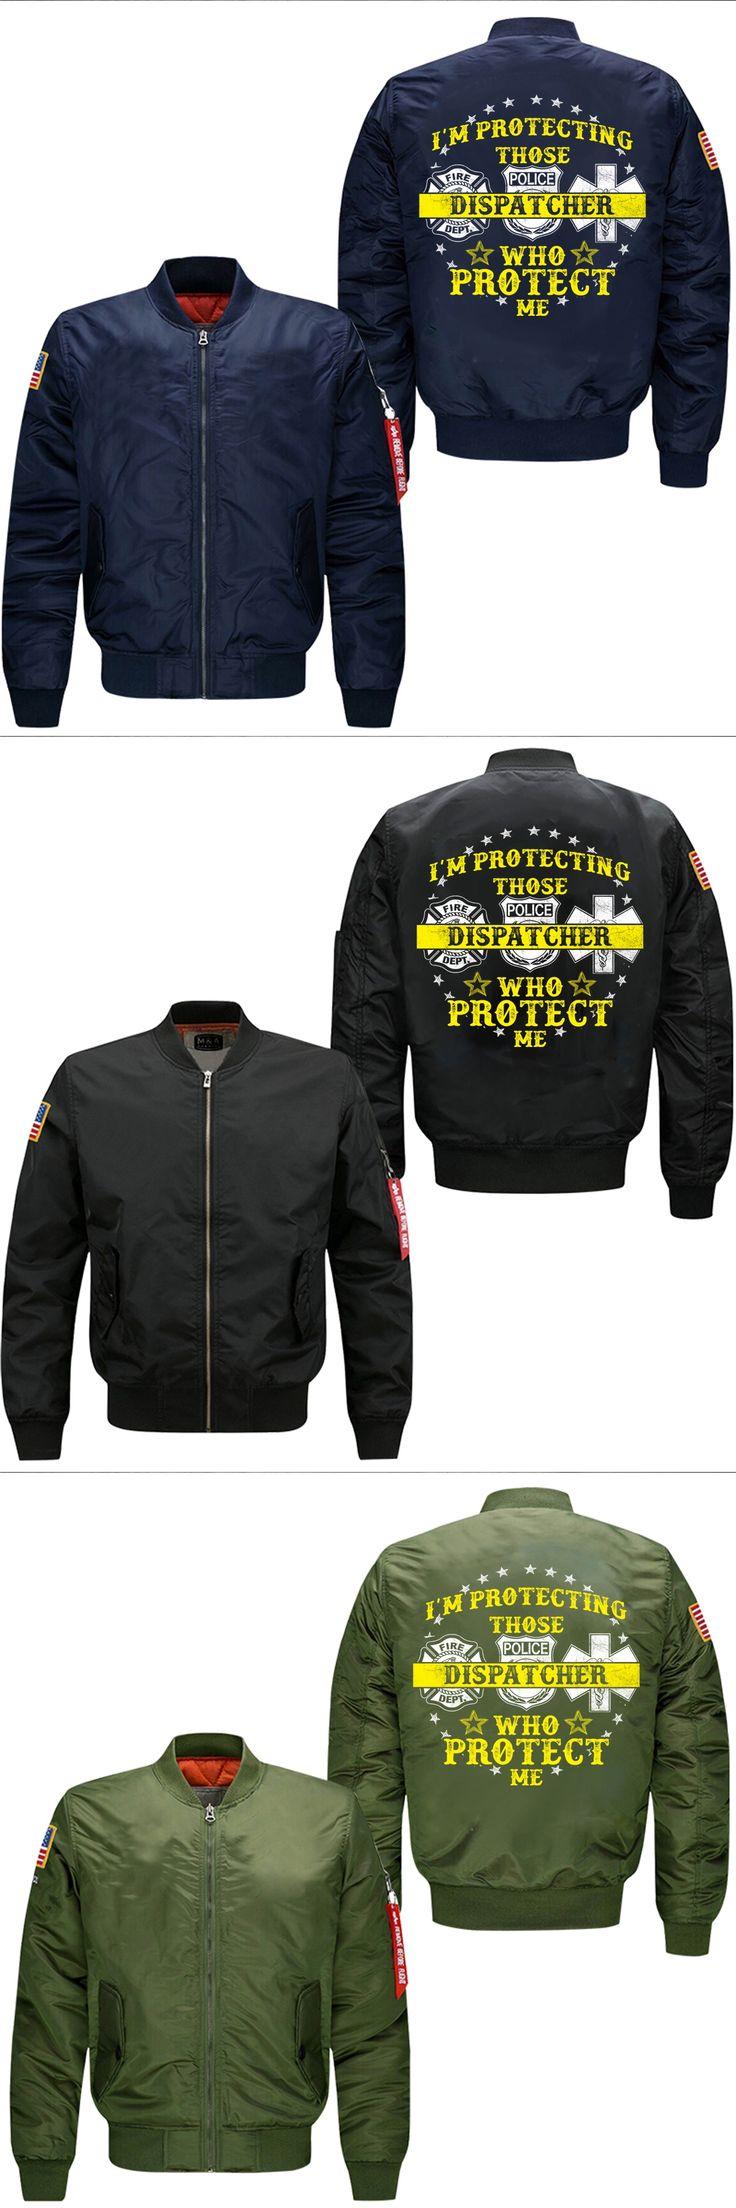 2017 new I AM PROTECTING spring men's flight jacket  leisure collar code Air Force pilots mans windbreaker jacket,EU siz